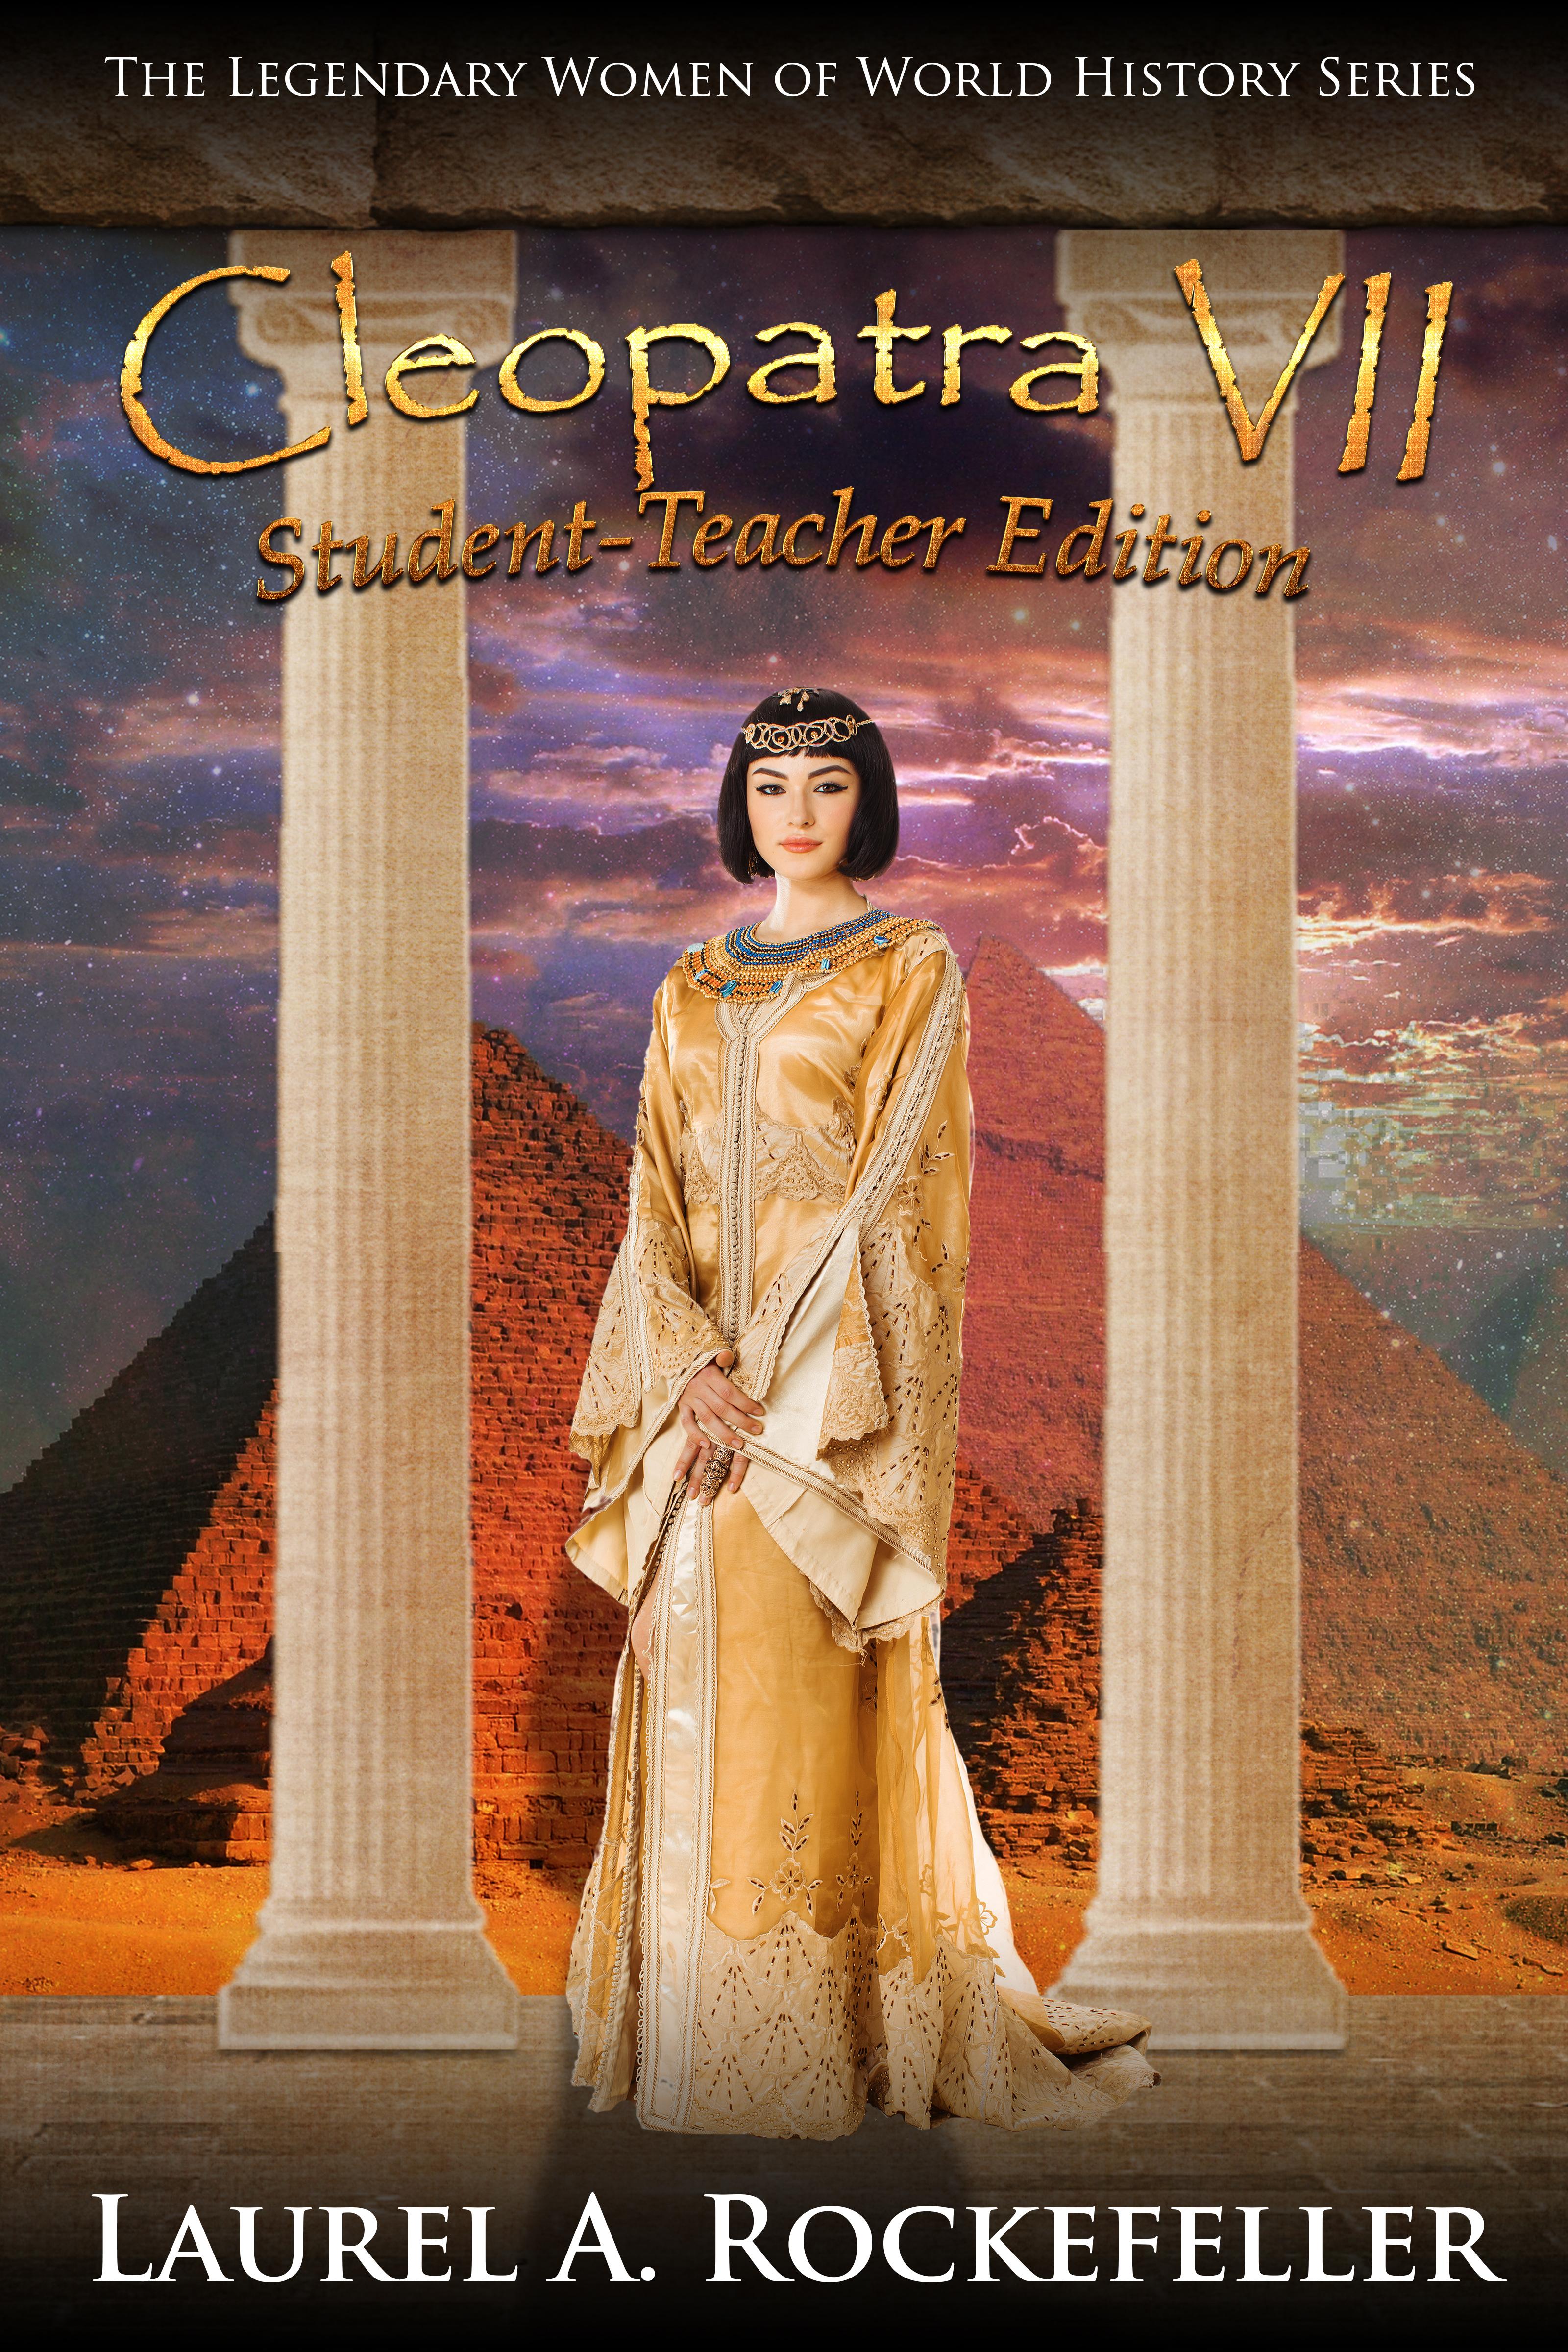 Cleopatra vii: student - teacher edition